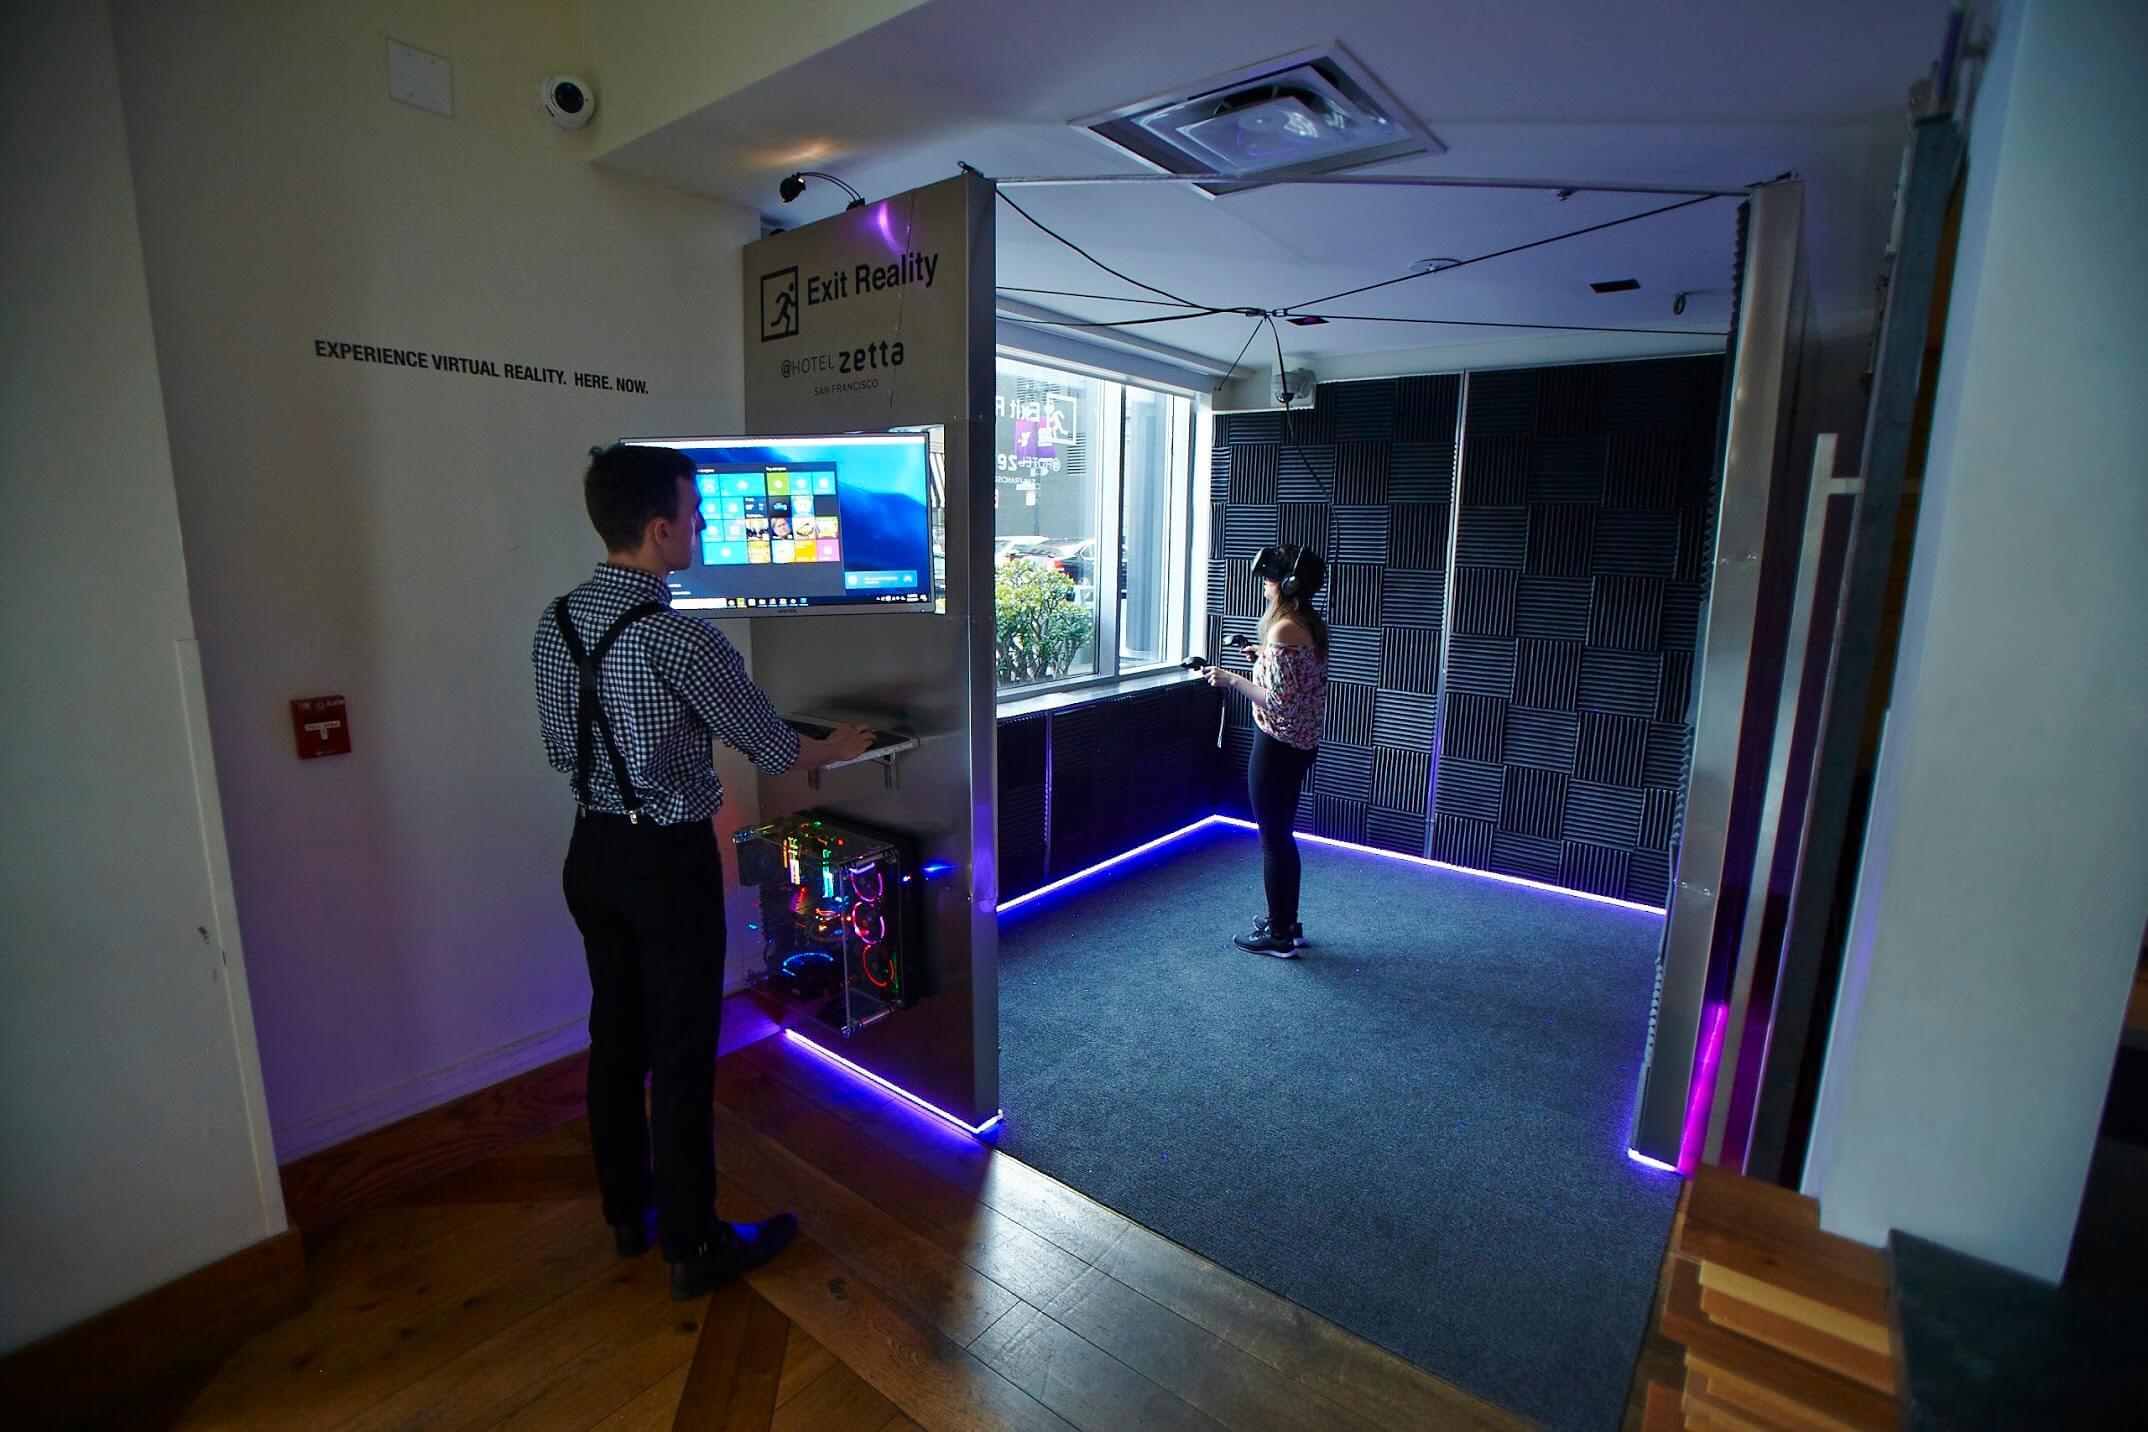 Hotel Zetta Introduces Virtual Reality Experiences Hotel